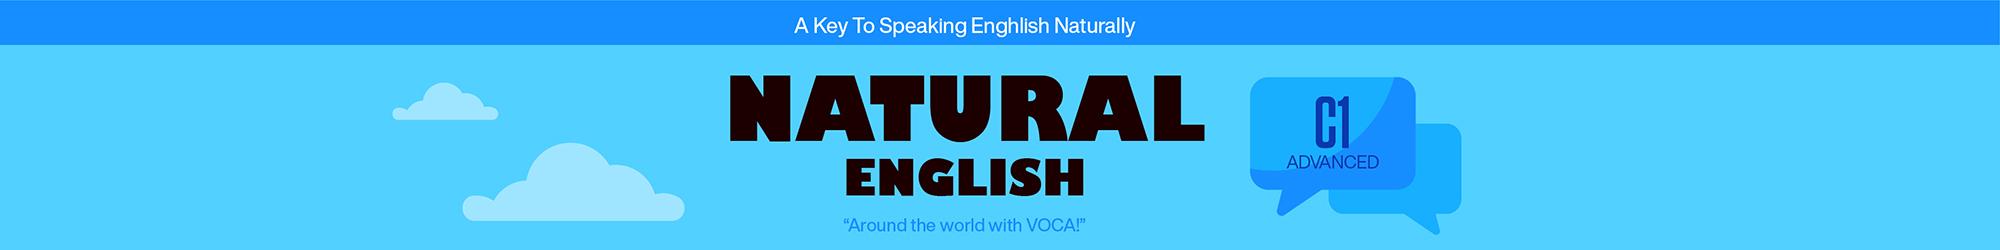 NATURAL ENGLISH C1 banner